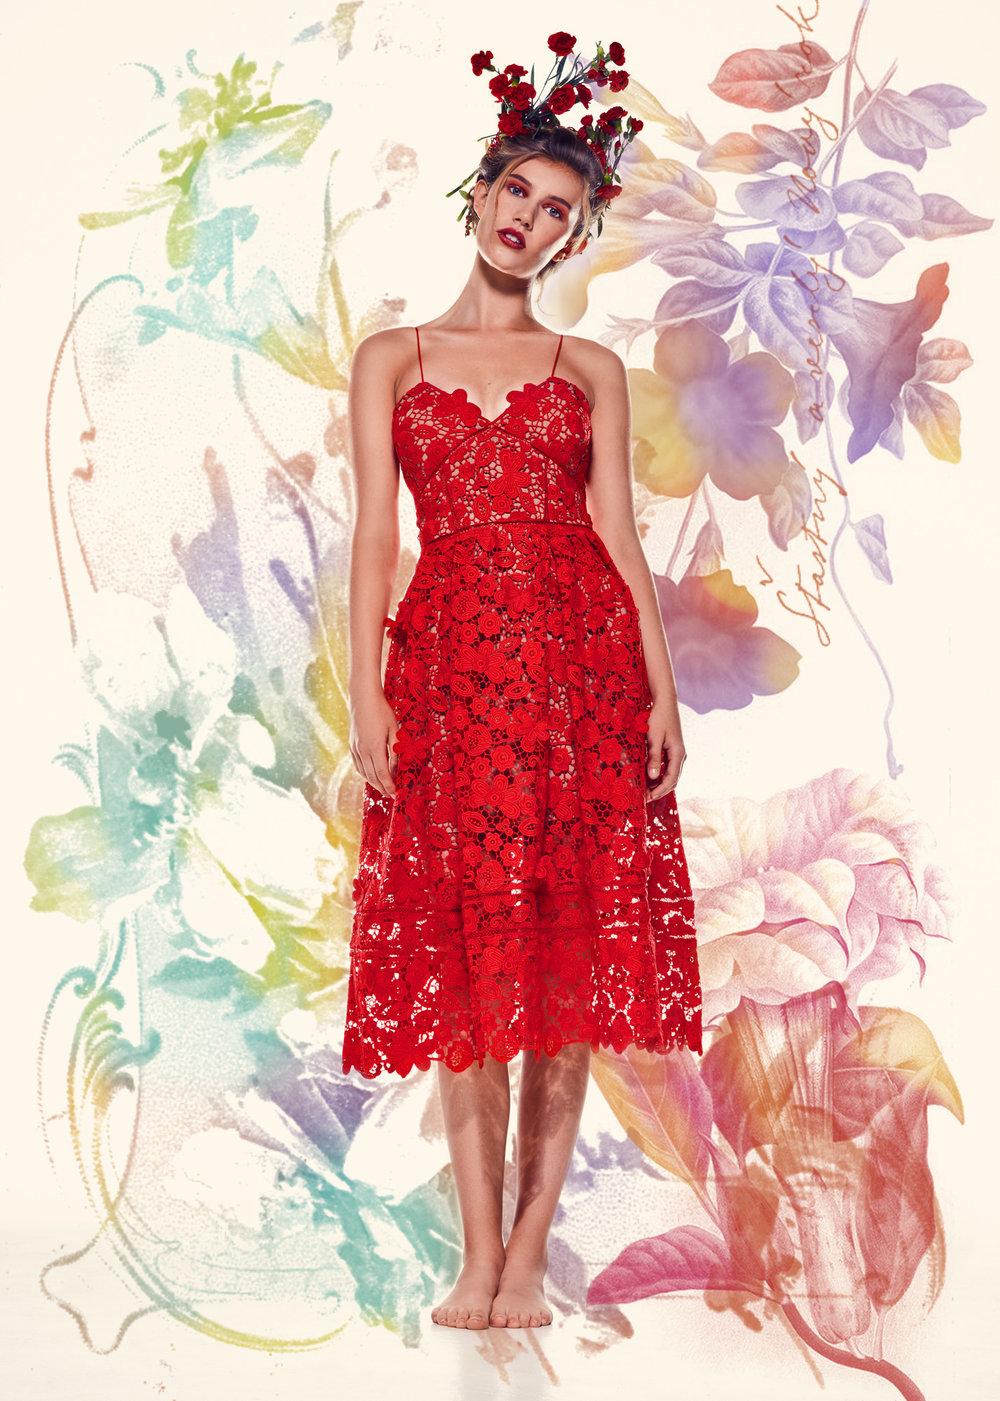 FashionEditorial_Ambra.jpg